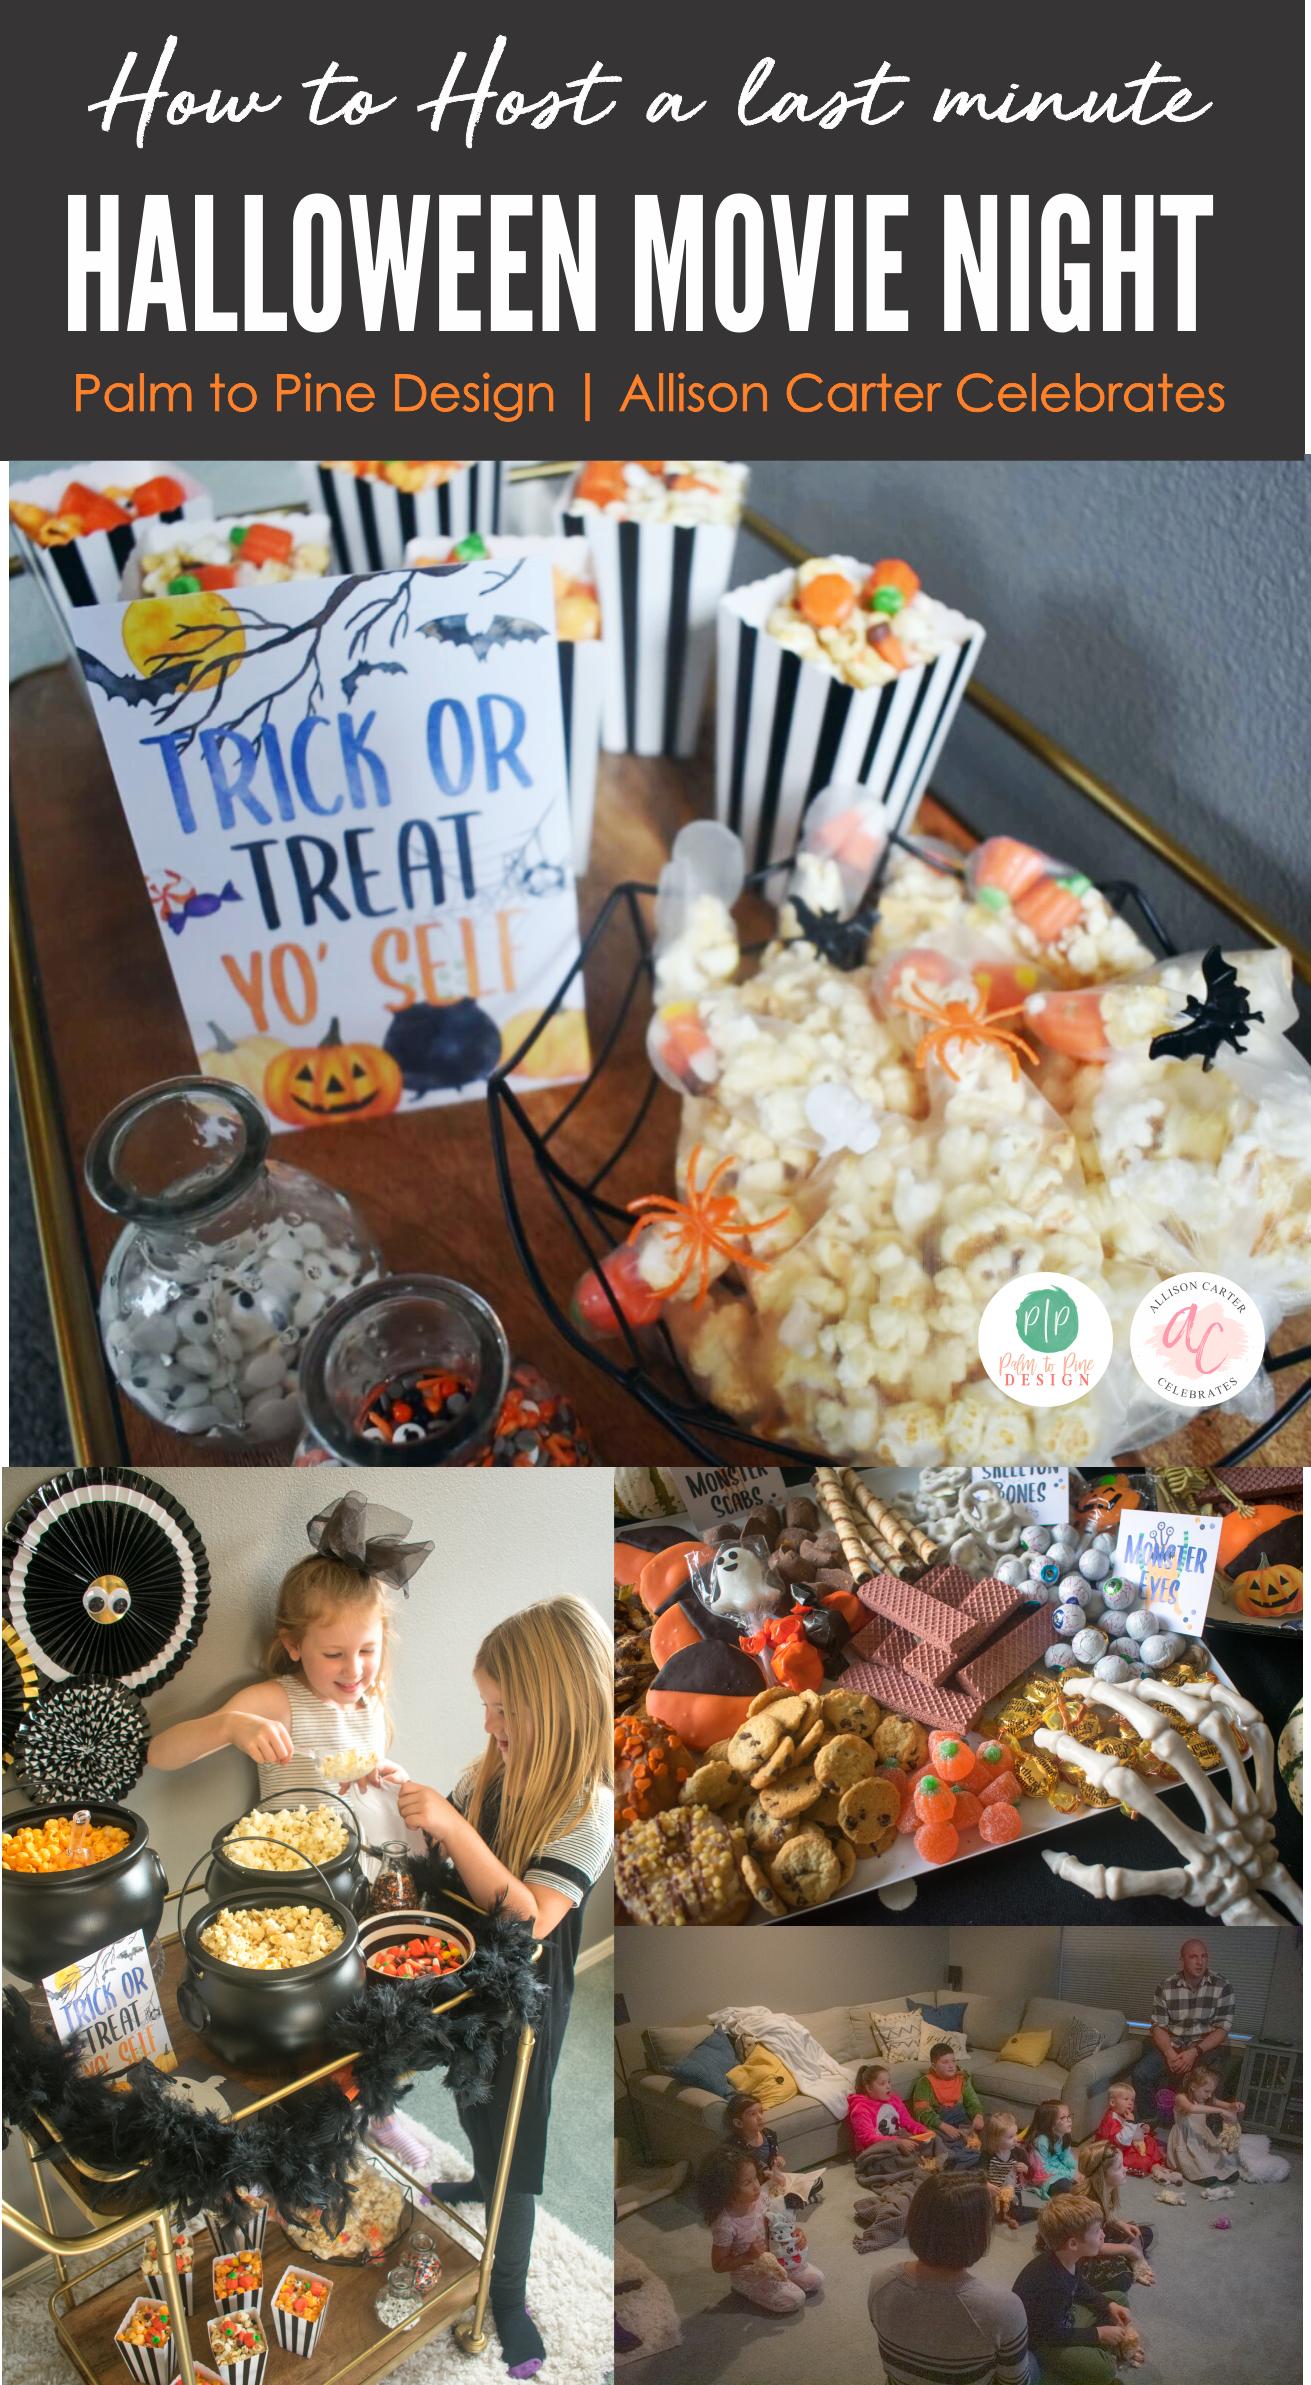 Host a last minute Halloween Movie Night, Best Halloween